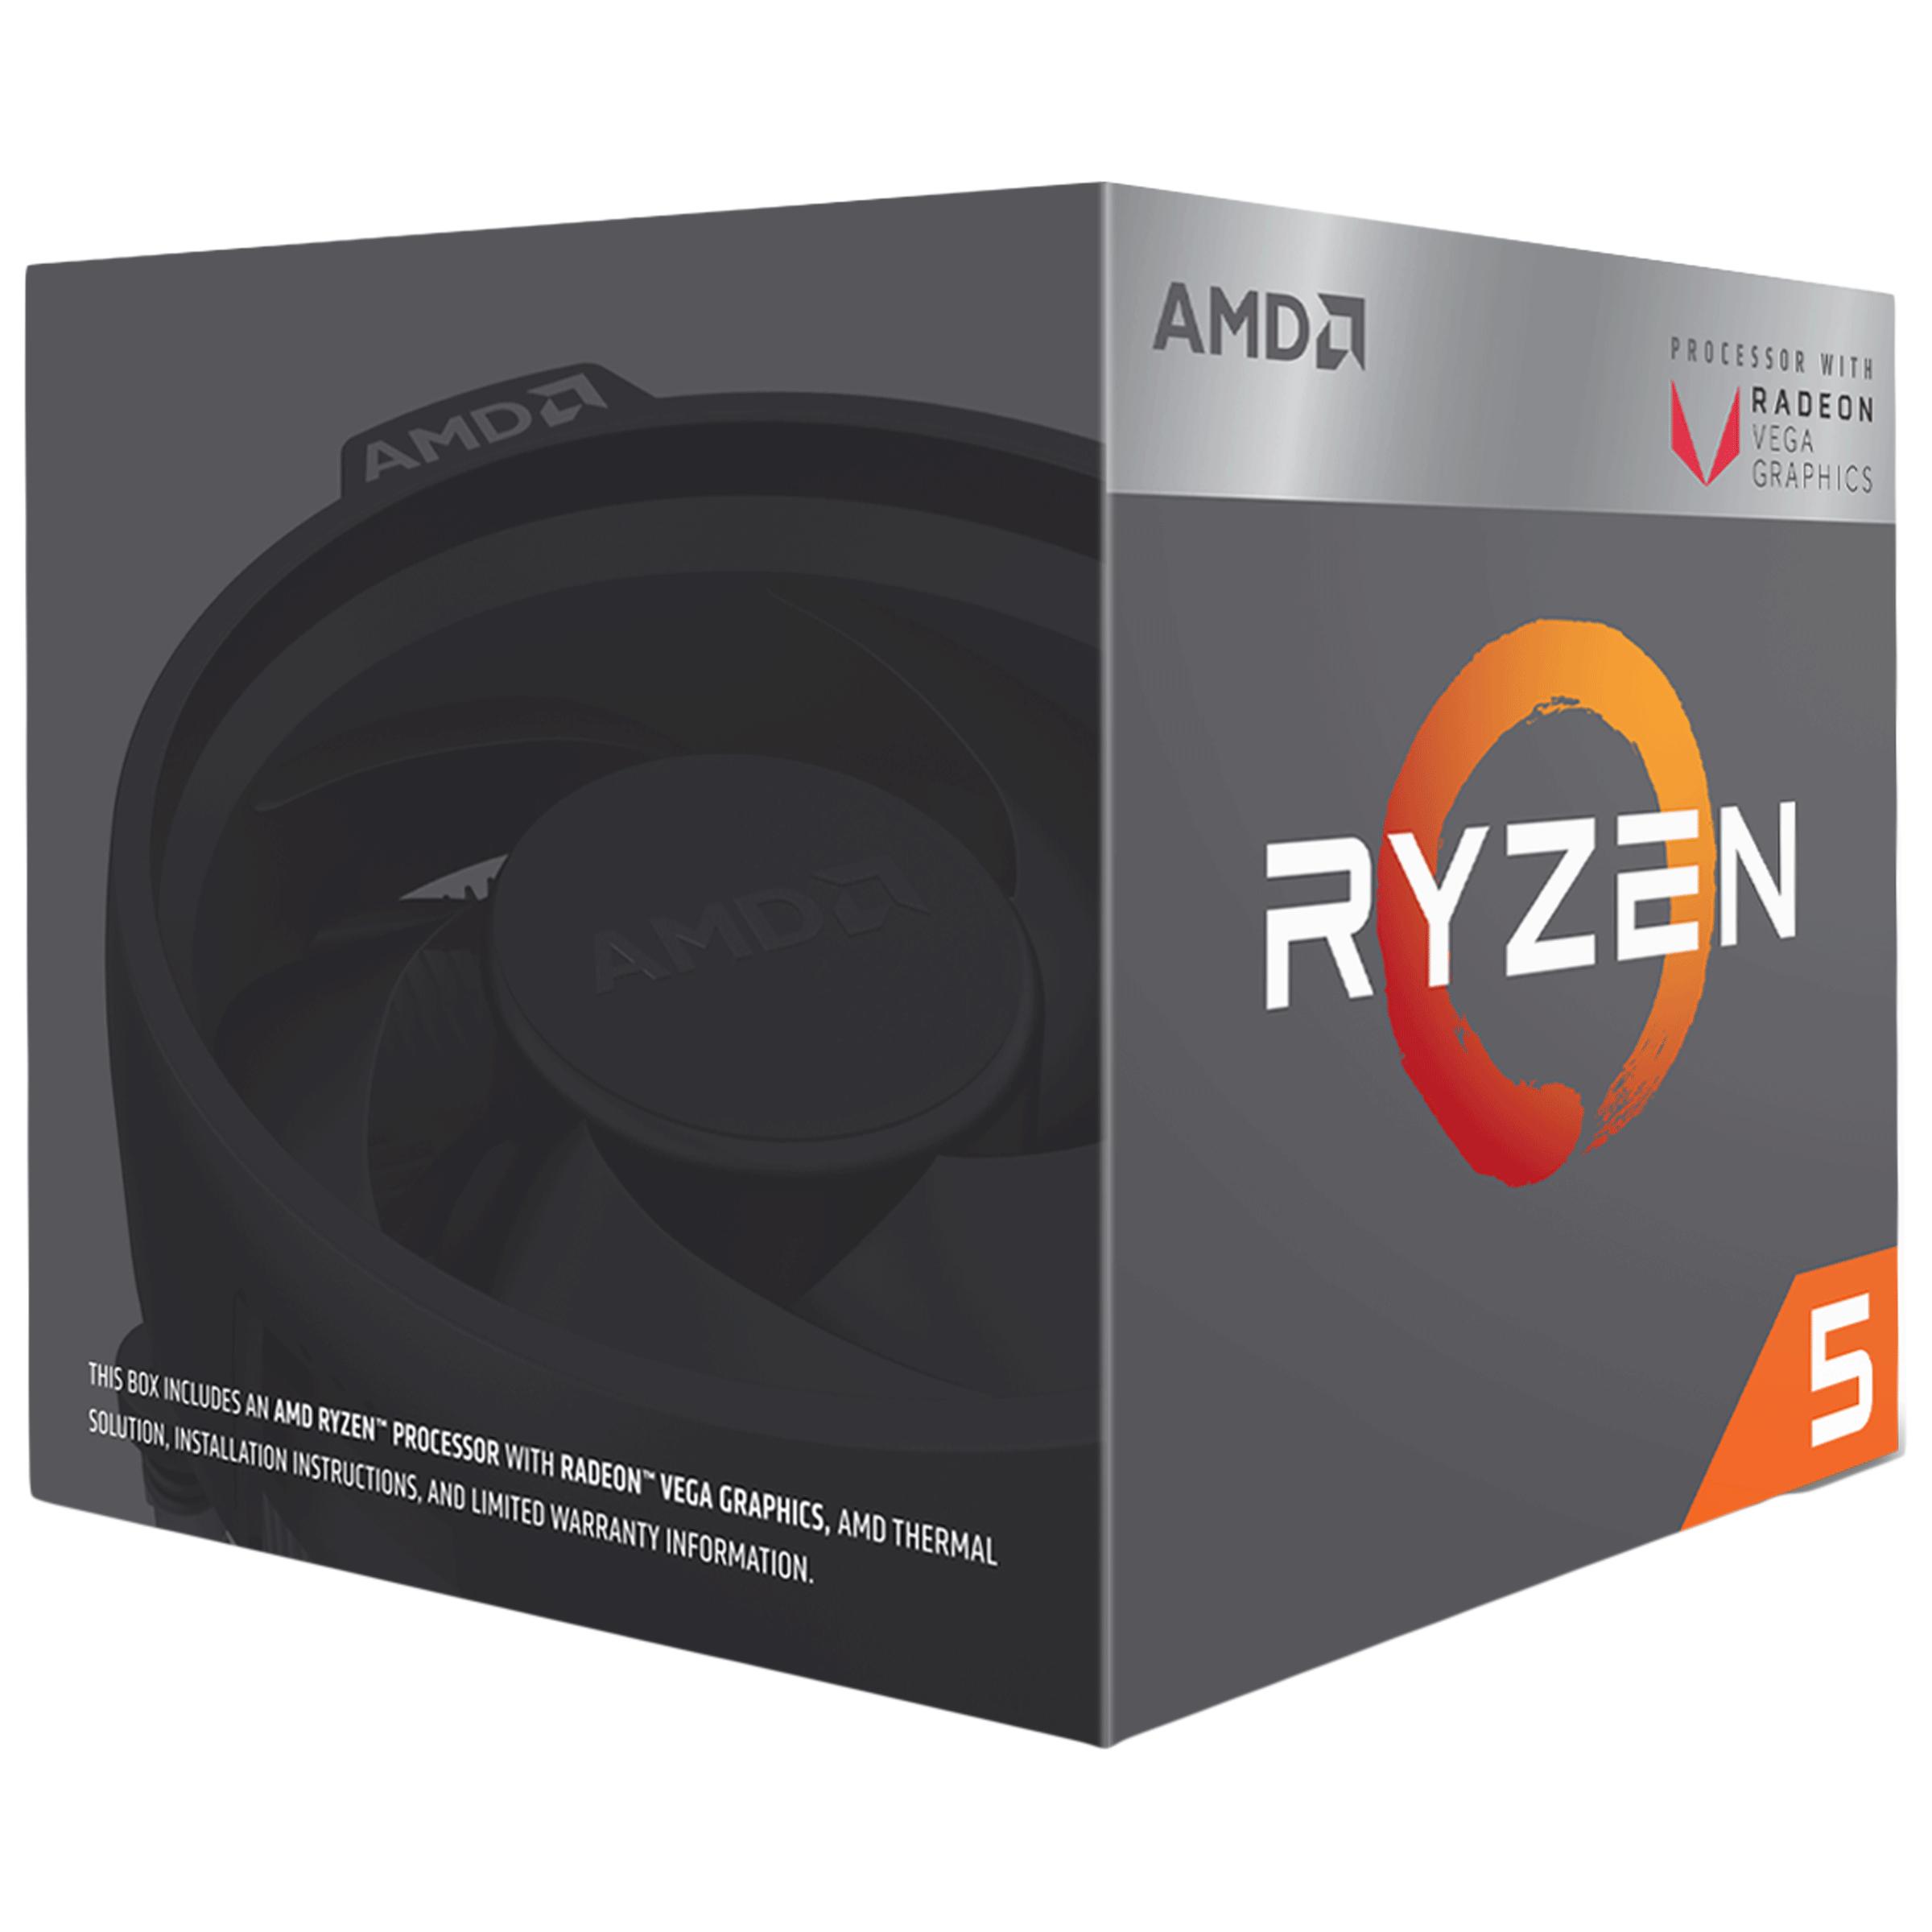 AMD Ryzen 5 Desktop Box Processor (4 Cores, 3.7 GHz, Unlocked For Overclocking, 3400G, Silver)_1